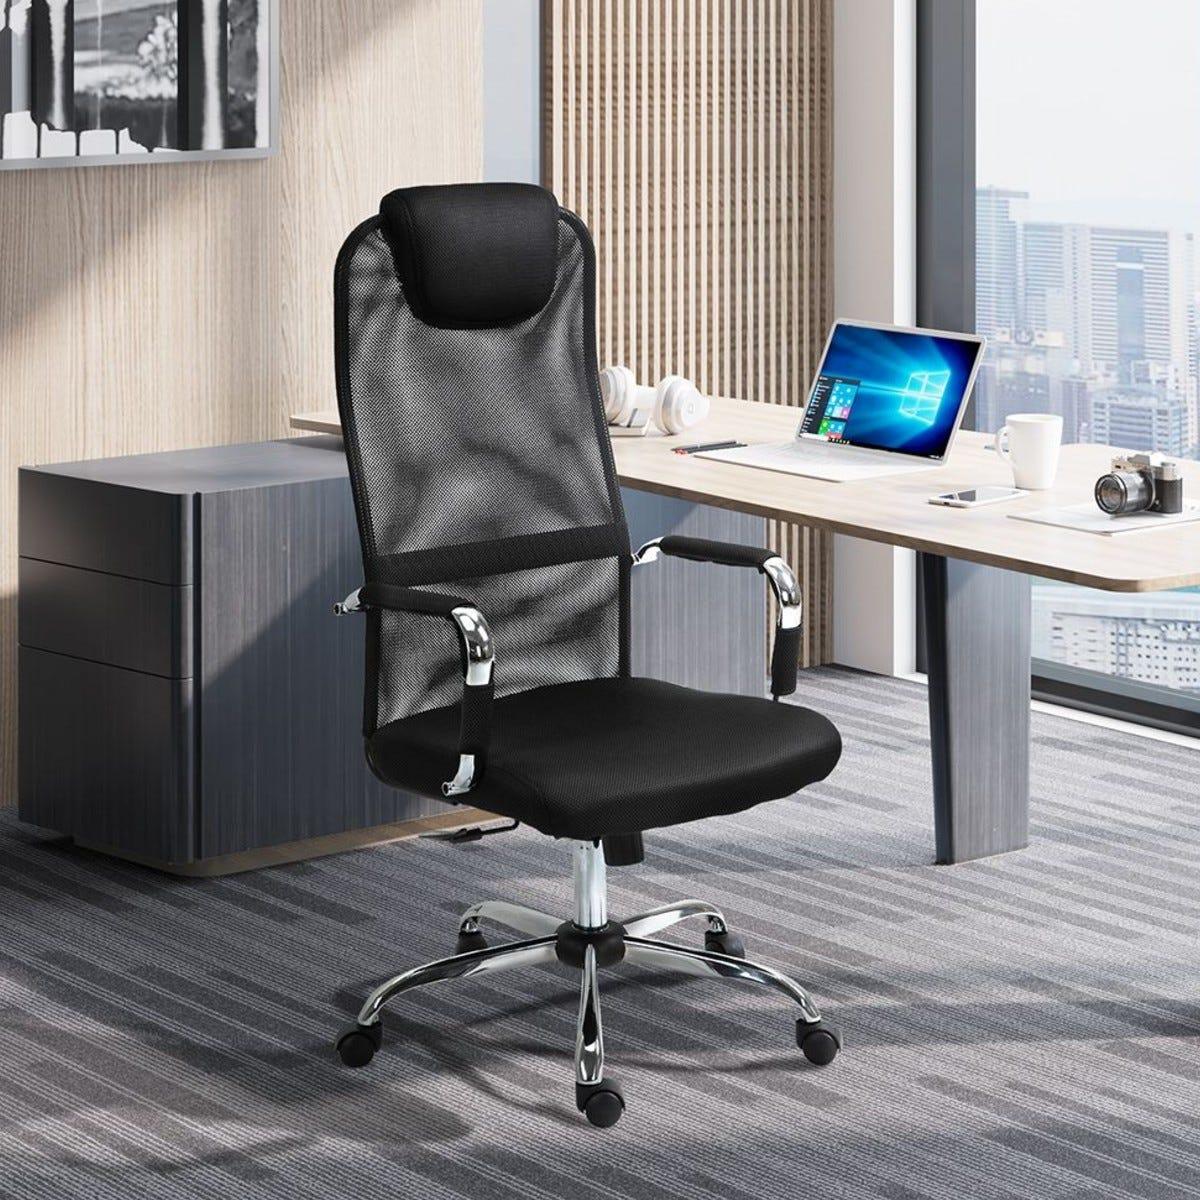 Office Chair Mesh Fabric Swivel Rocker With Wheels Black